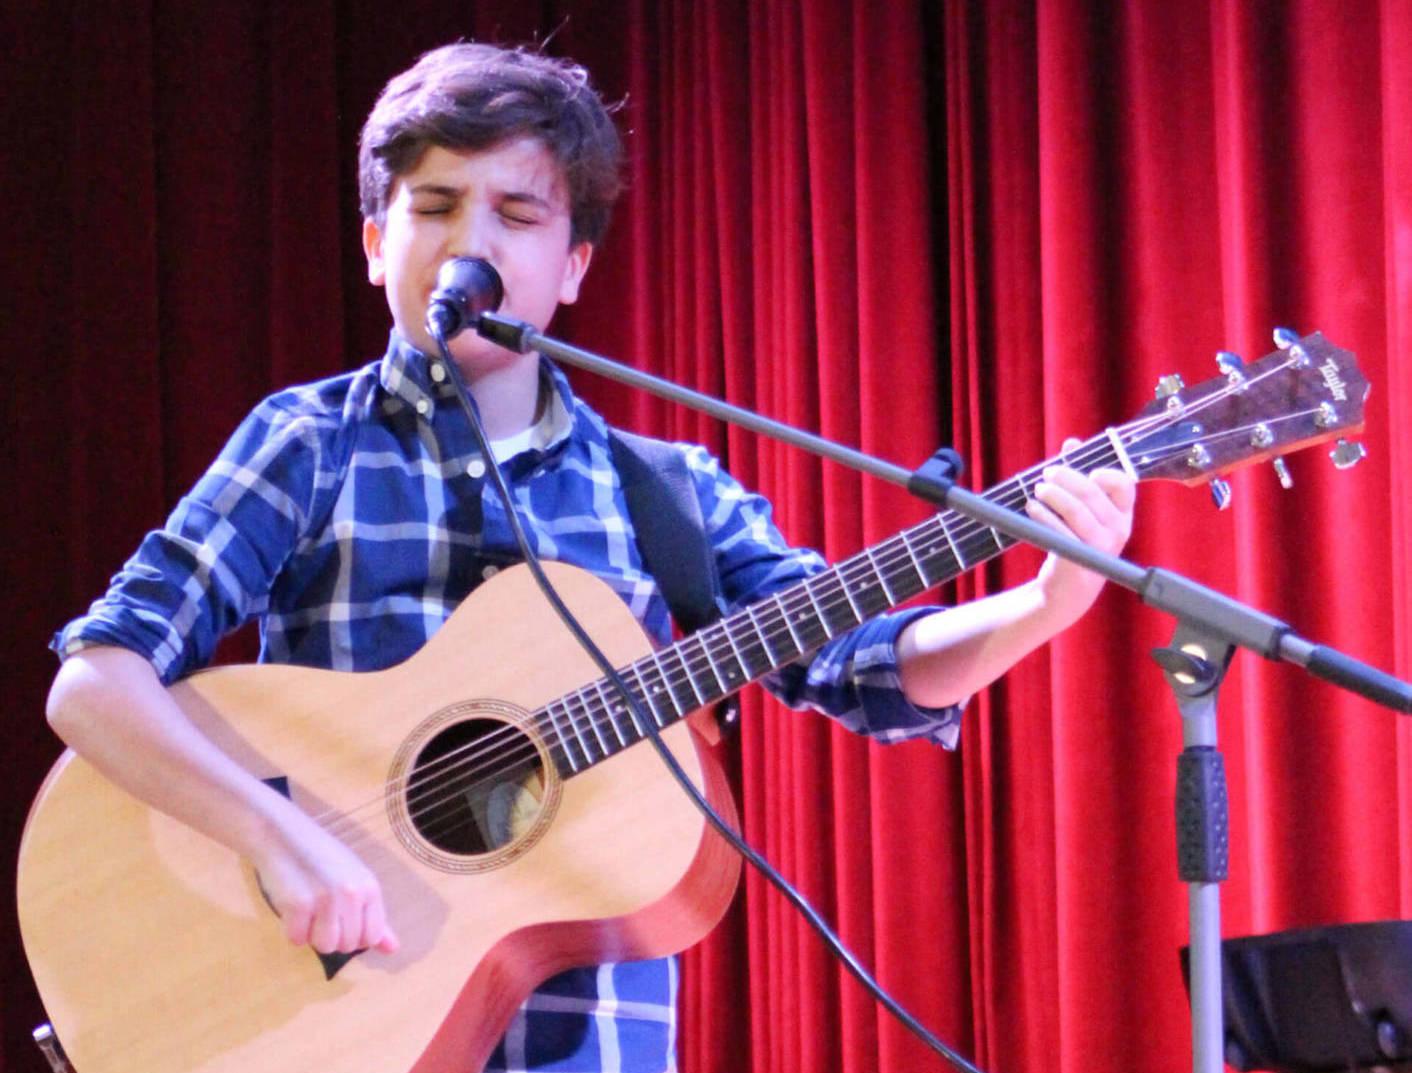 guitar-lessons-in-Tampa